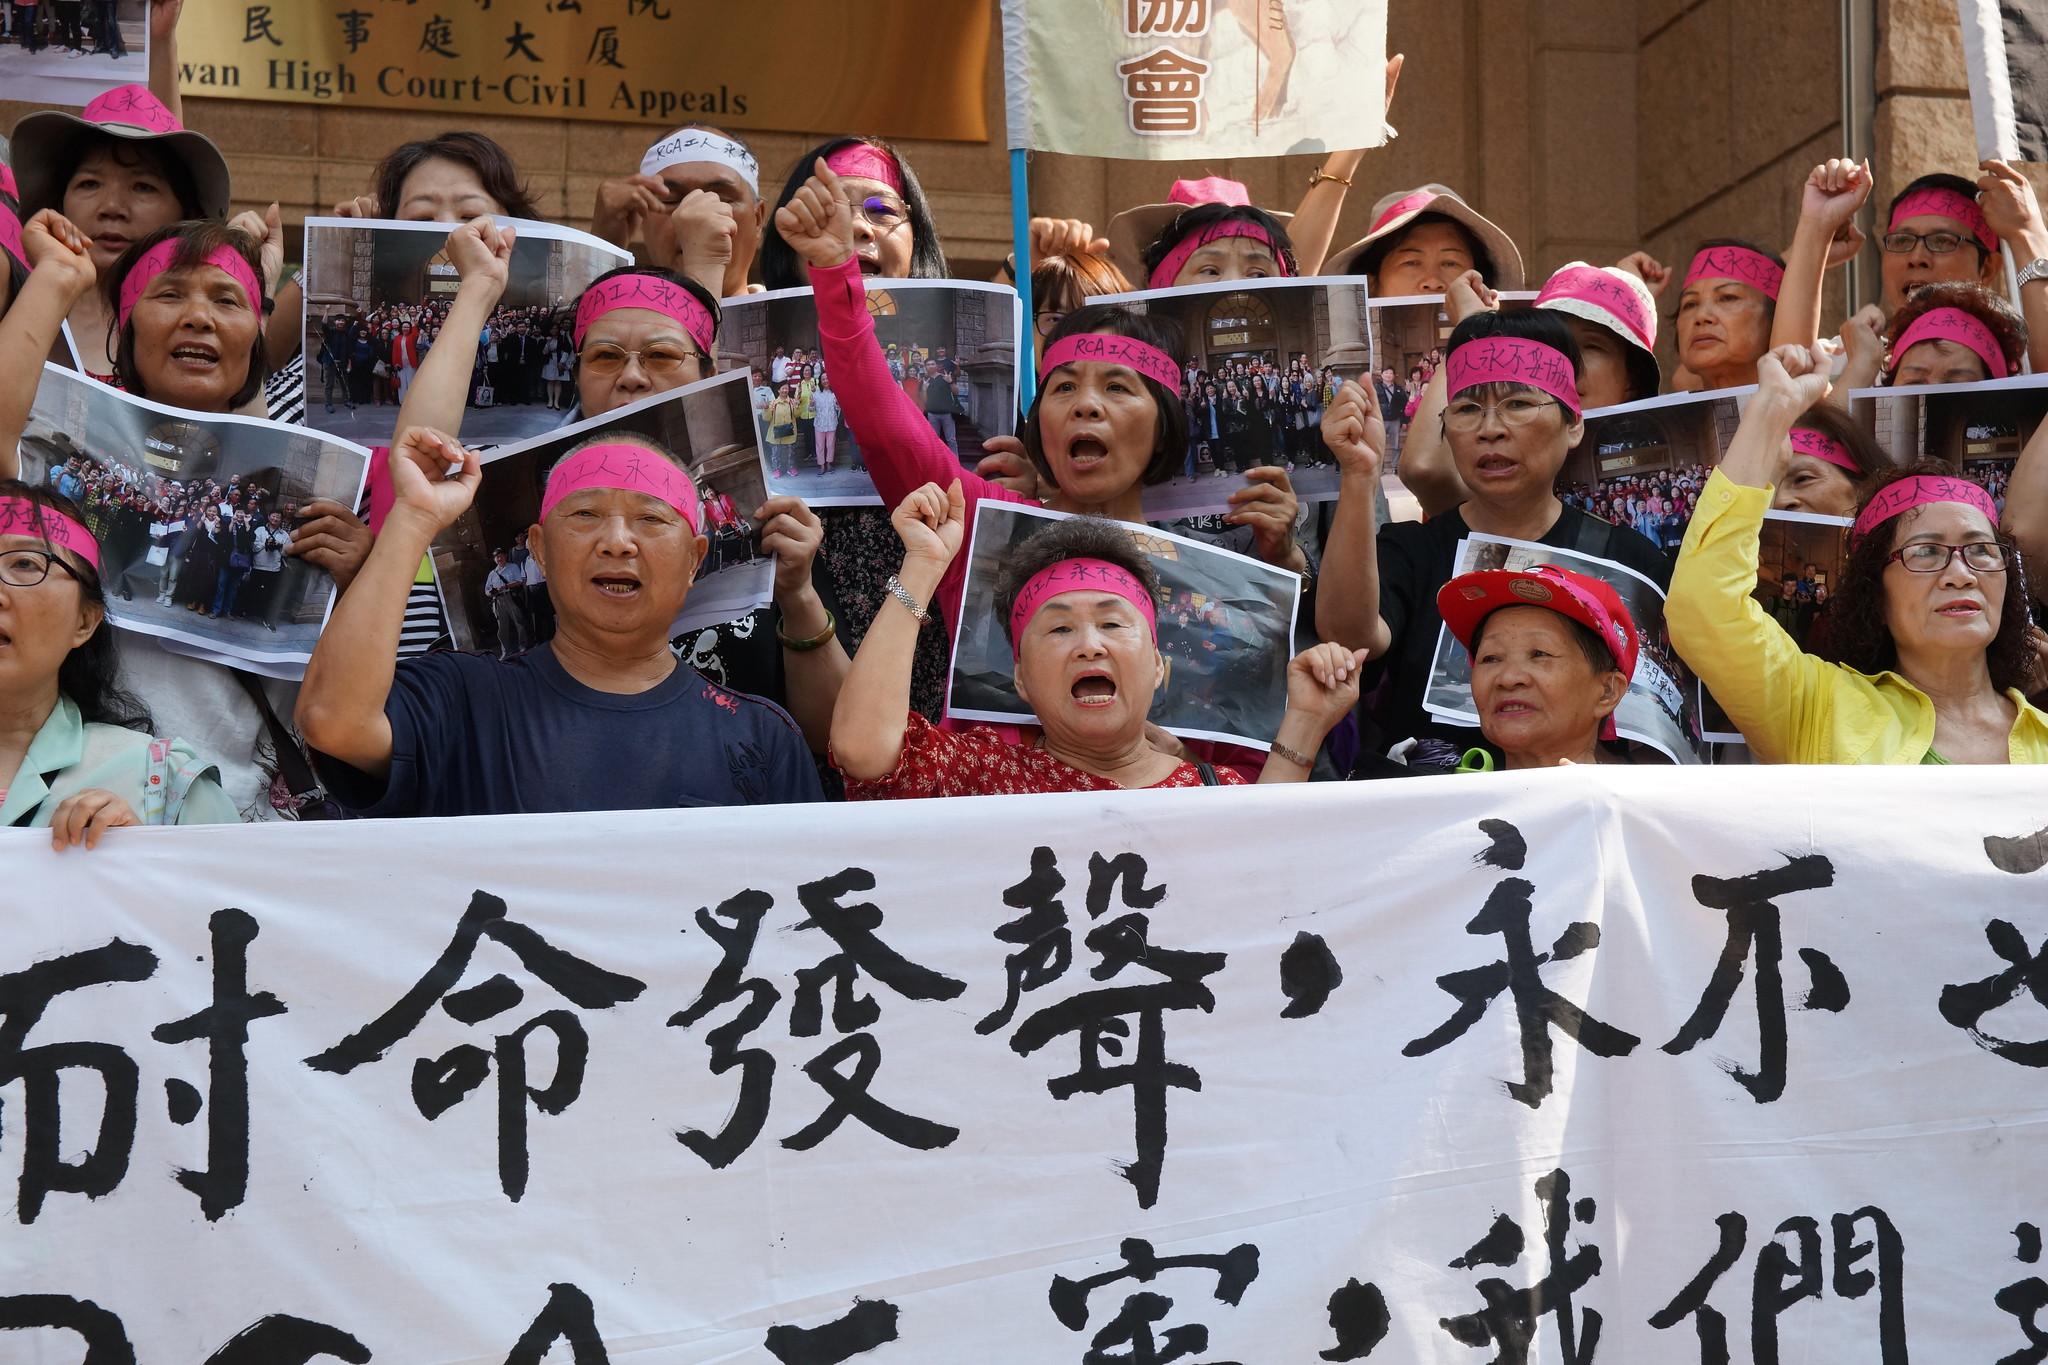 RCA訴訟官司走過19年,關懷協會在法庭外高喊「工人還在!」(攝影:王顥中)